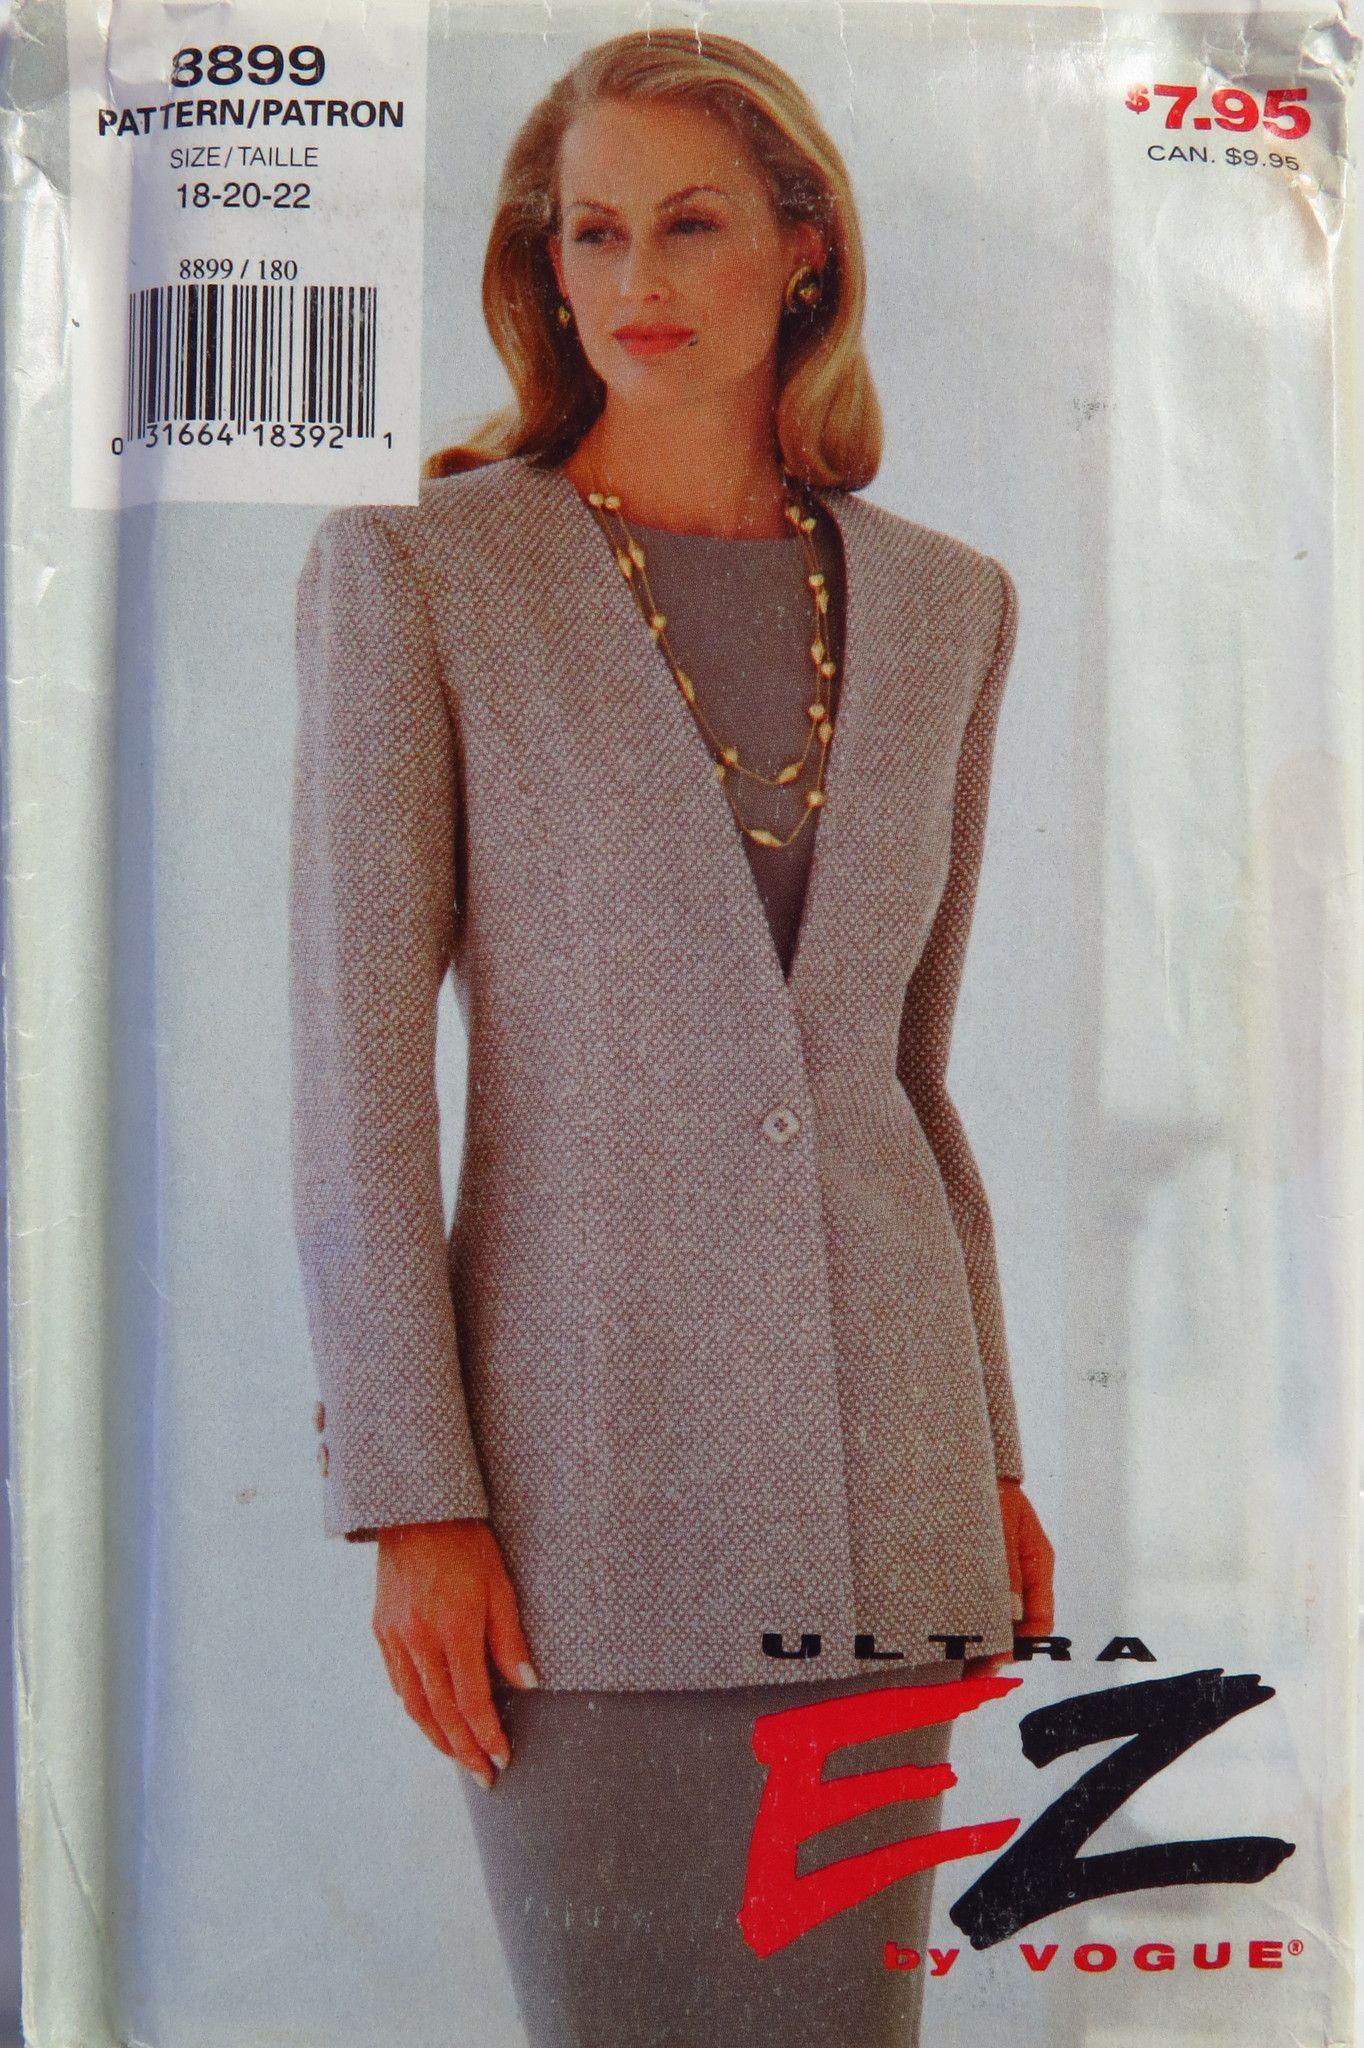 Vogue 8899 Misses\' Jacket and Dress | Vogue patterns, Dress patterns ...